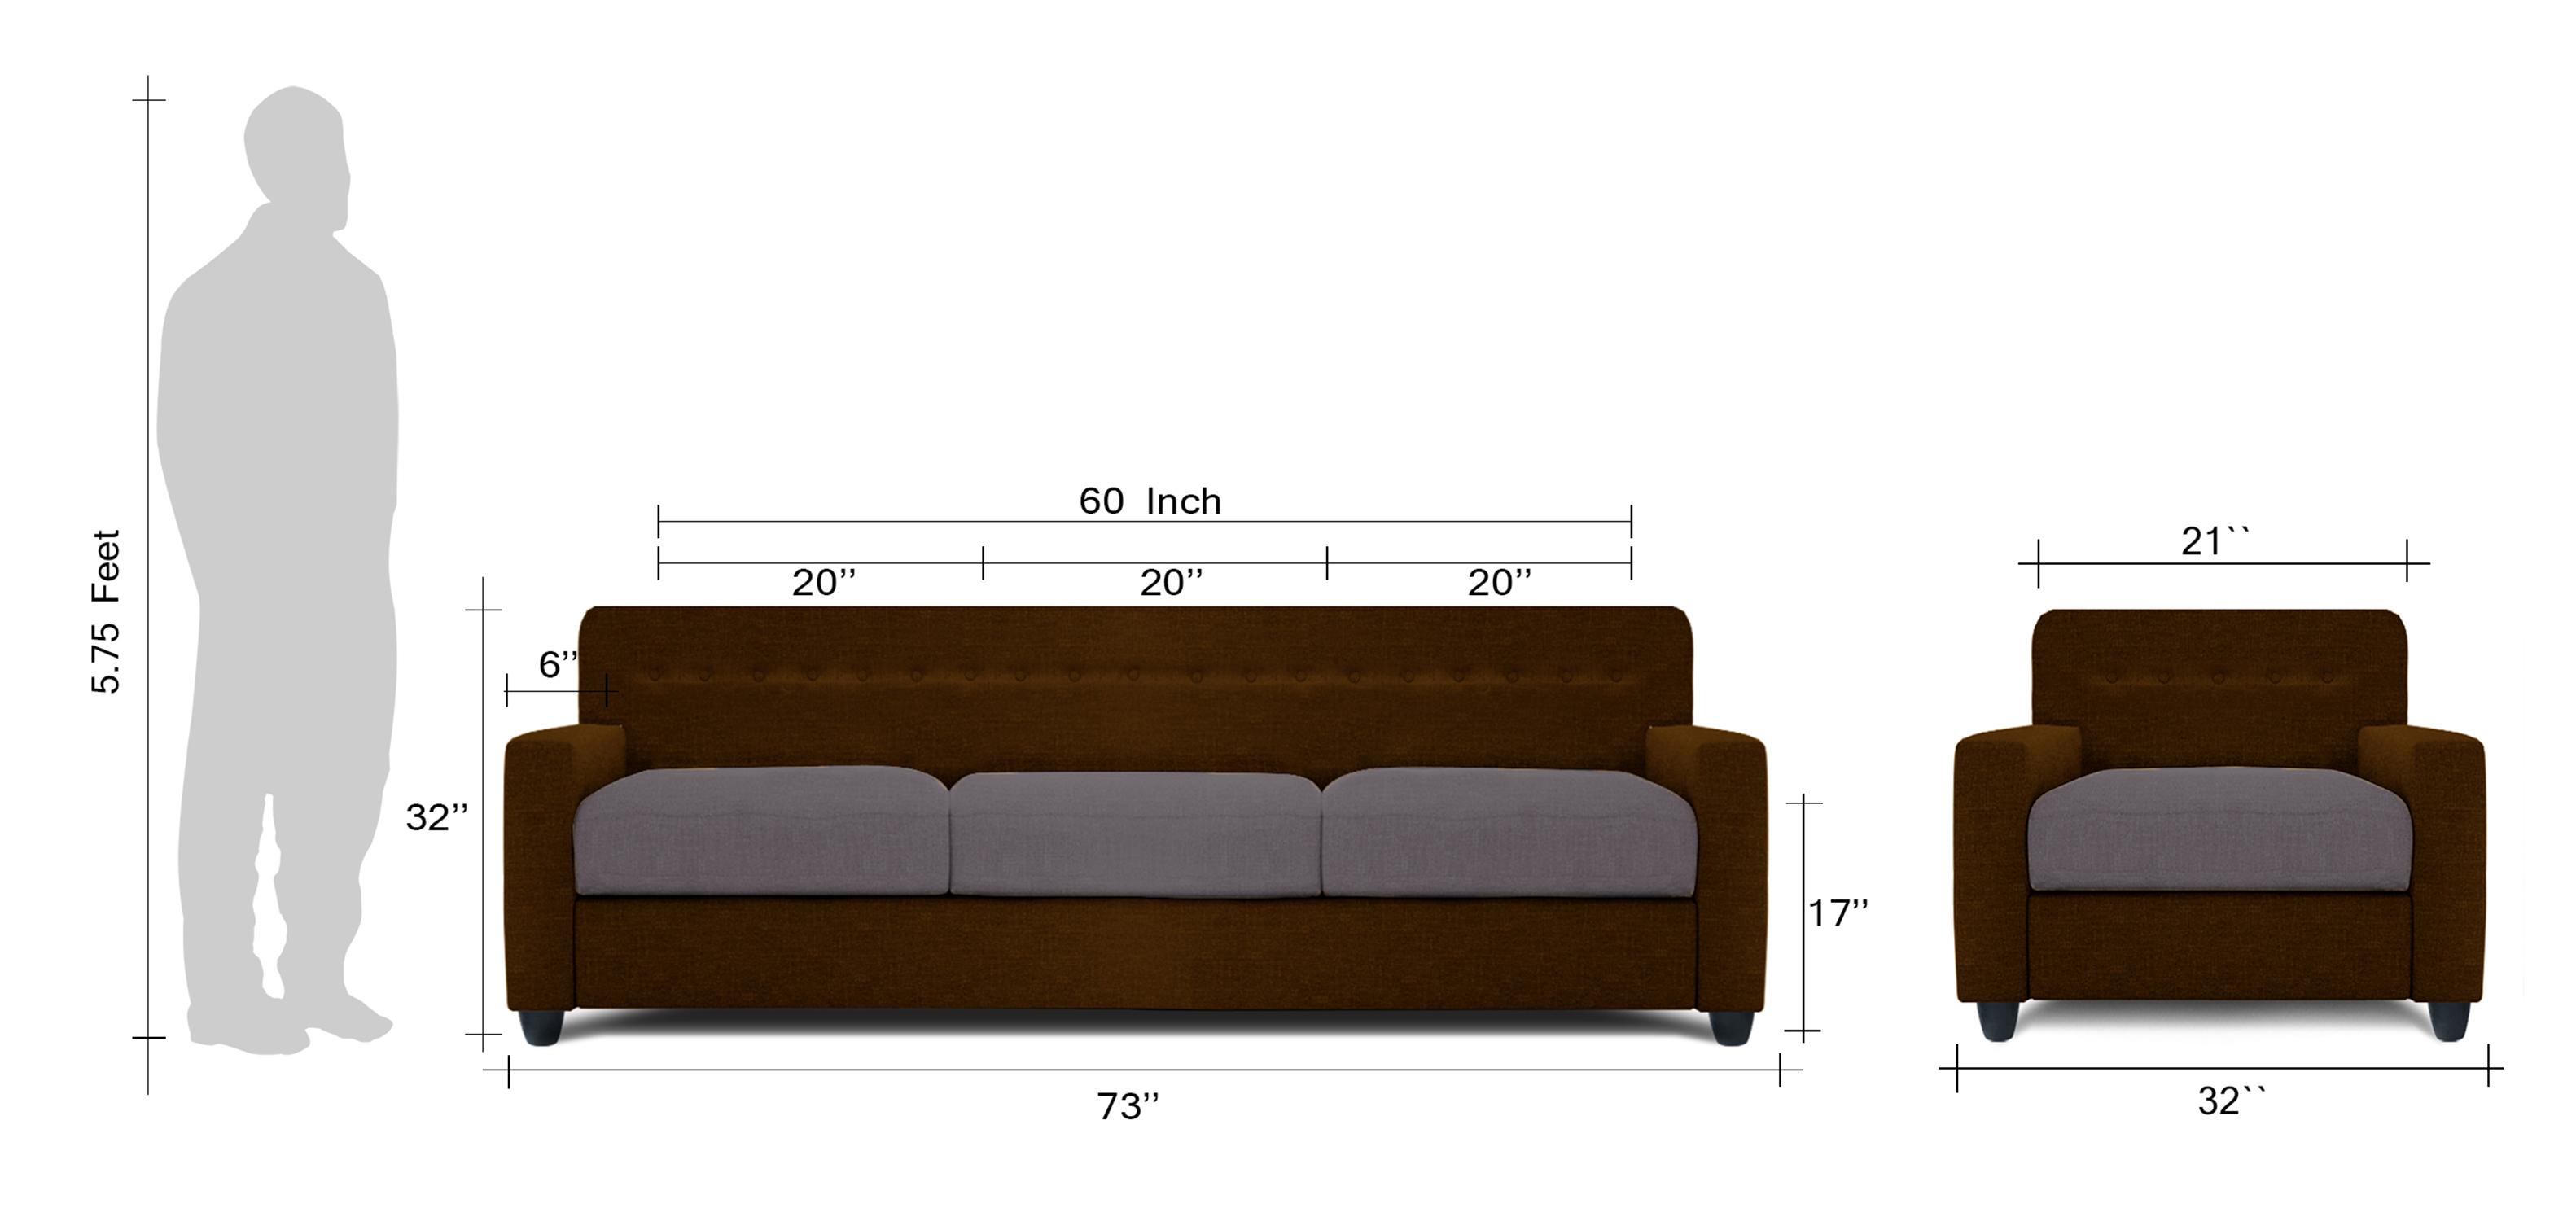 Adorn Homez Solitaire Fabric 1 Seater Sofa set Black